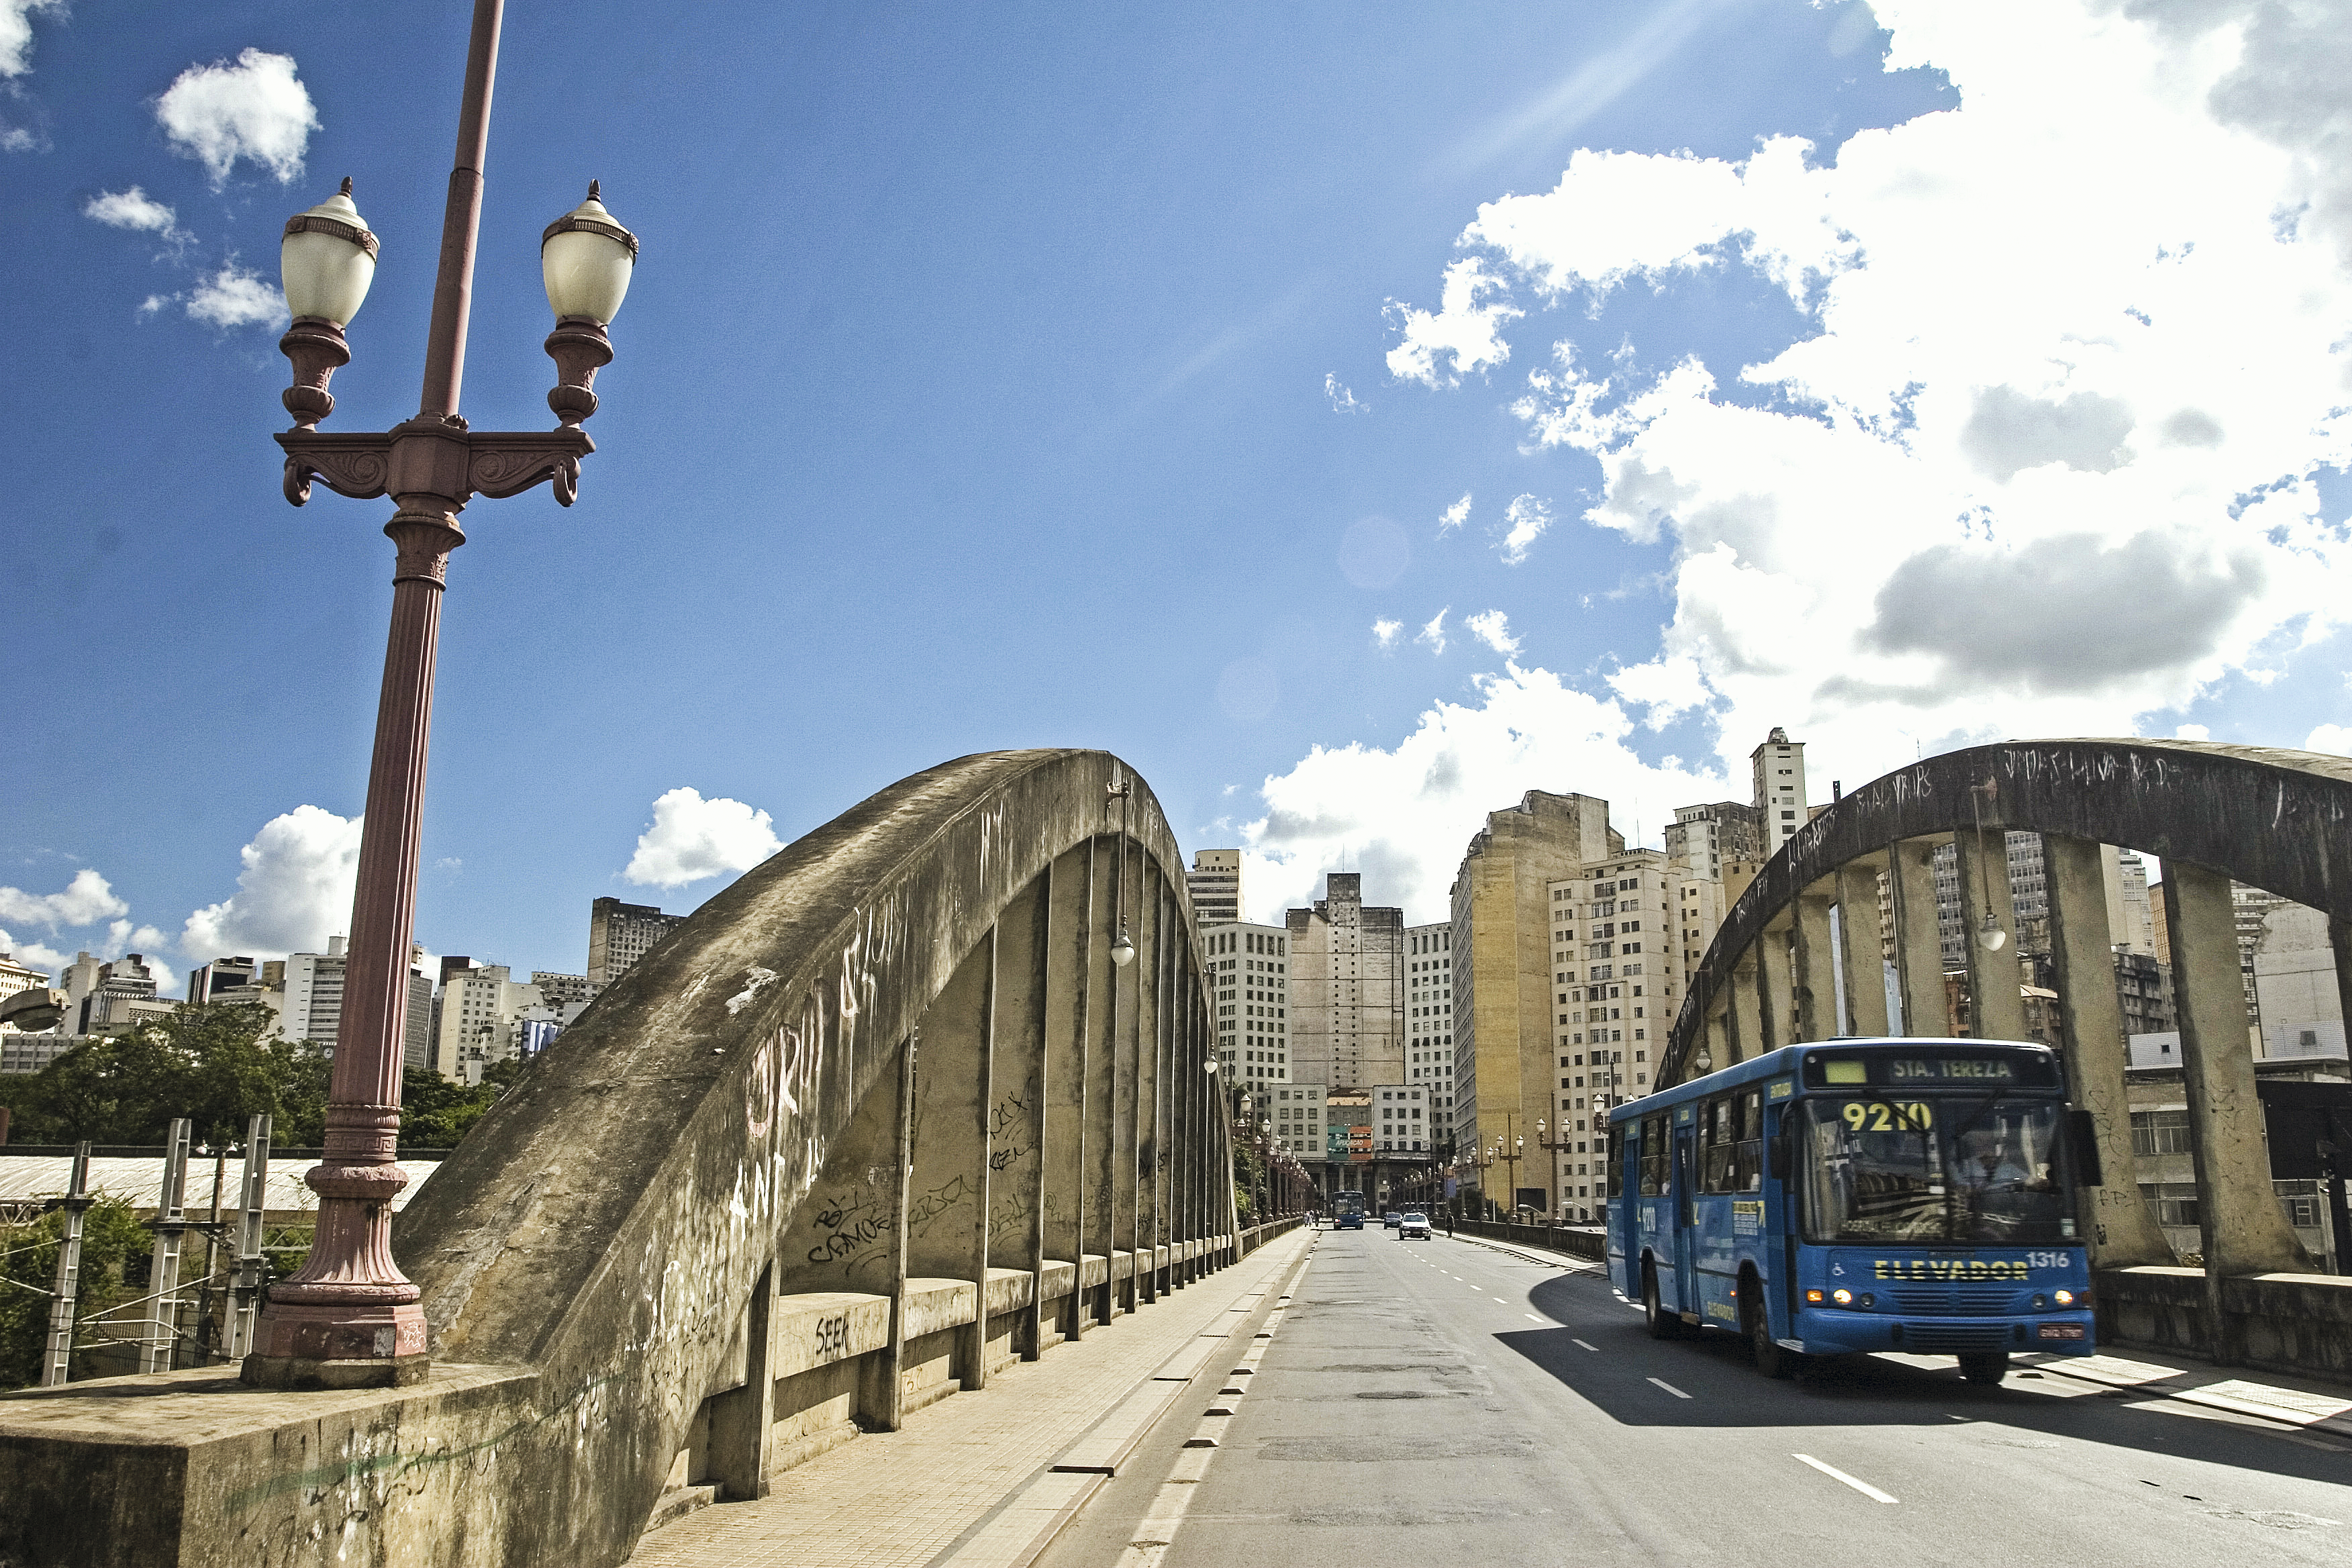 Viaduto Santa Tereza, Belo Horizonte, Minas Gerais, Brasil